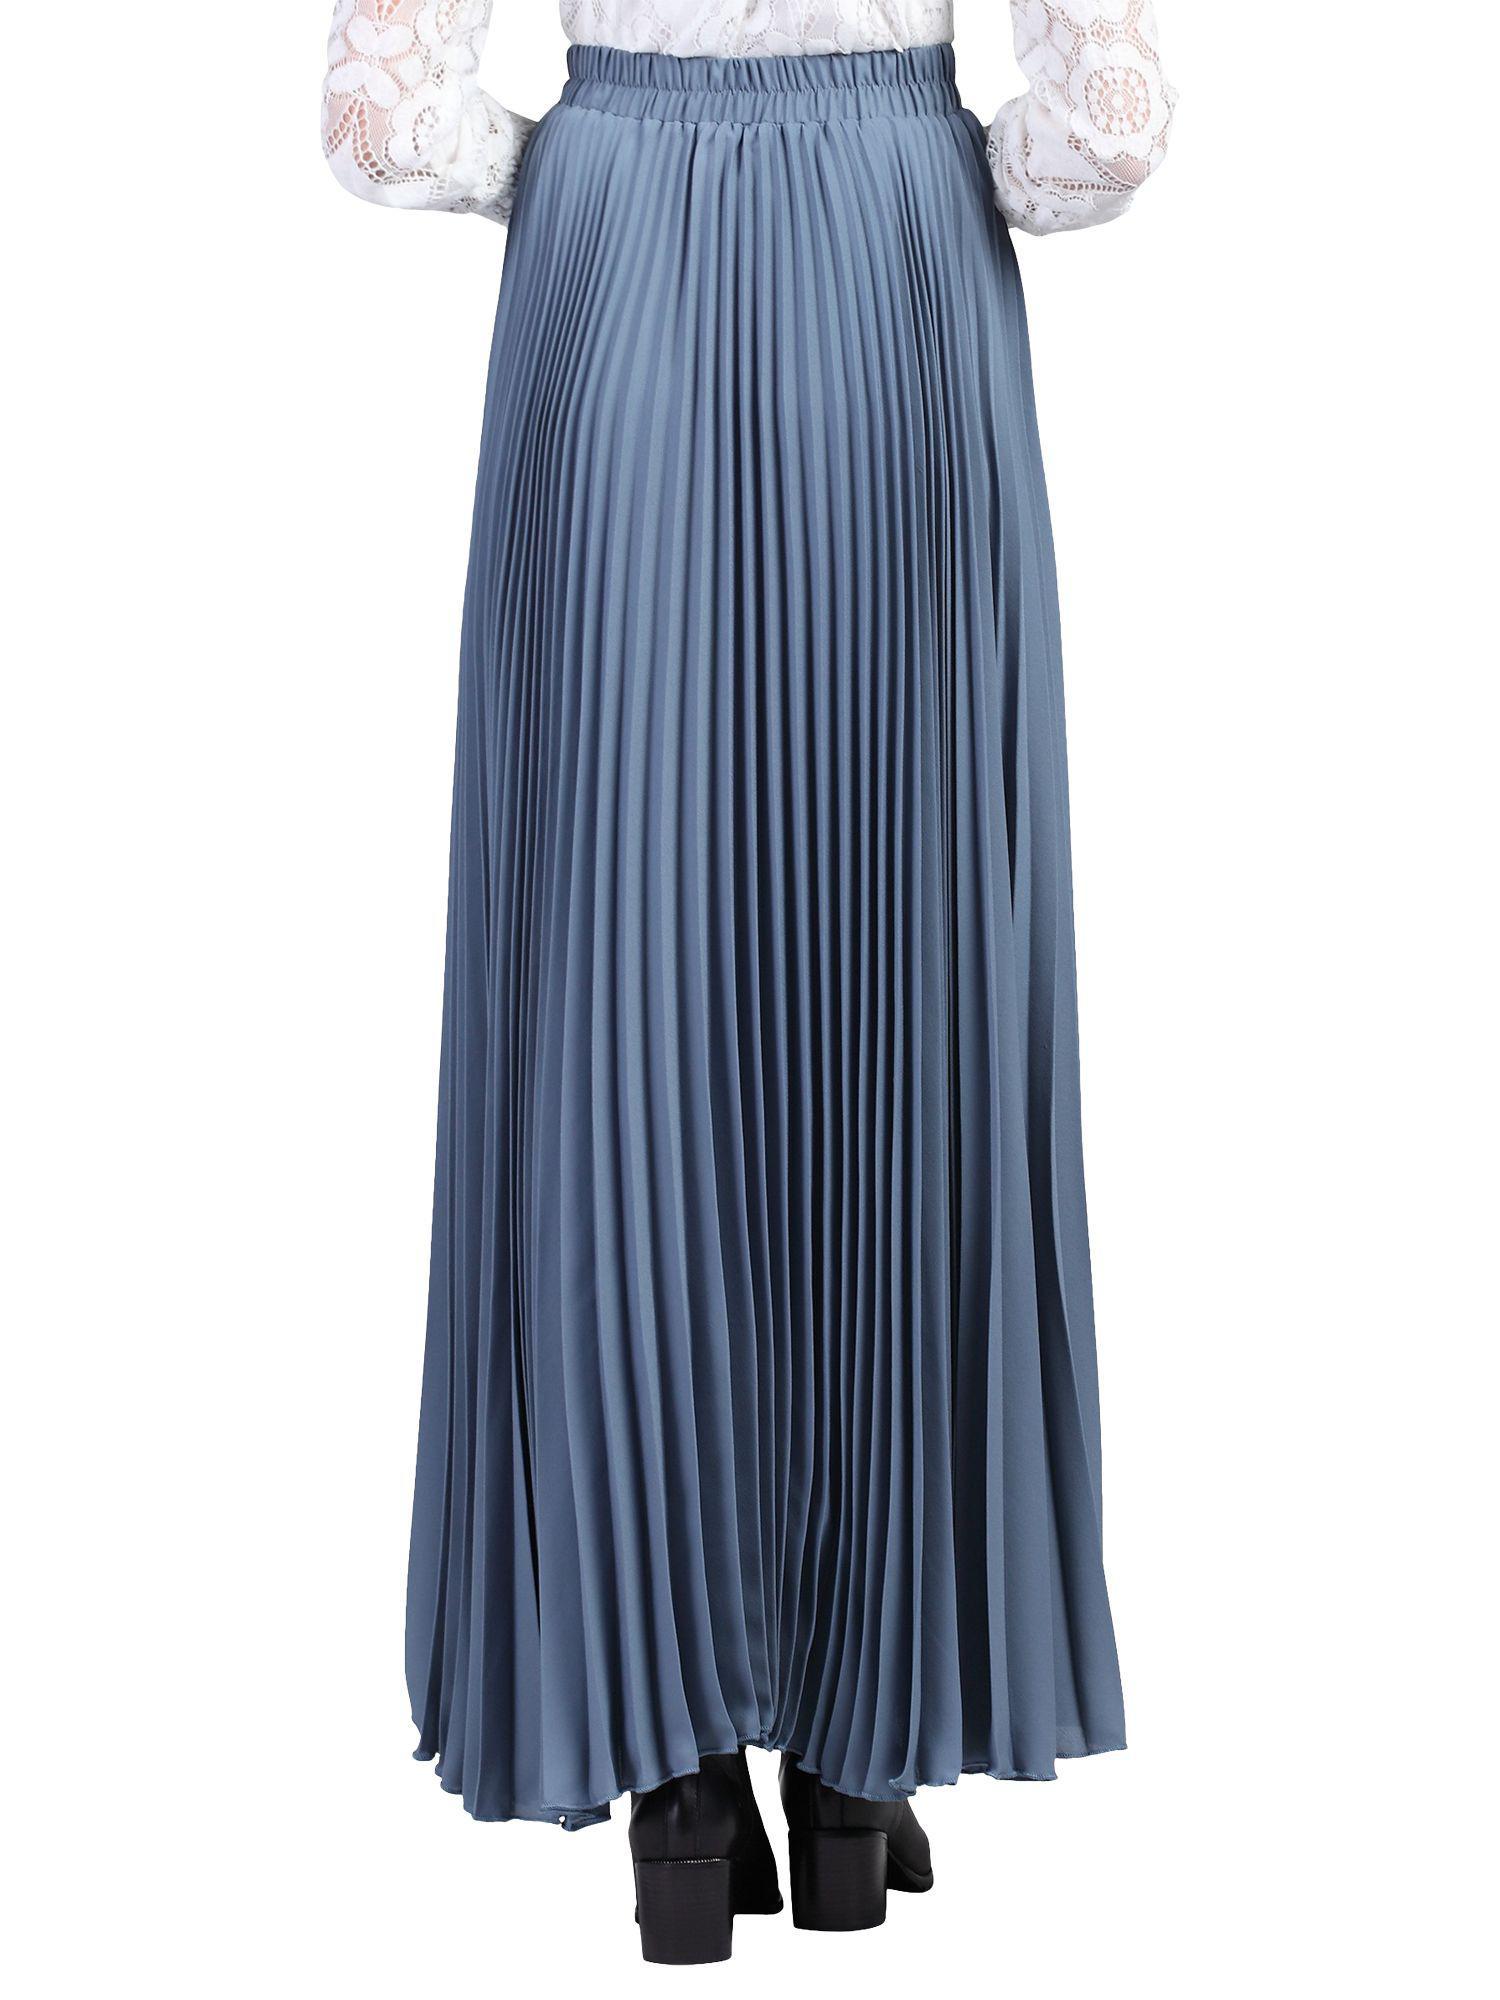 2b48ab1e59 Jolie Moi Pleated Crepe Maxi Skirt in Gray - Lyst